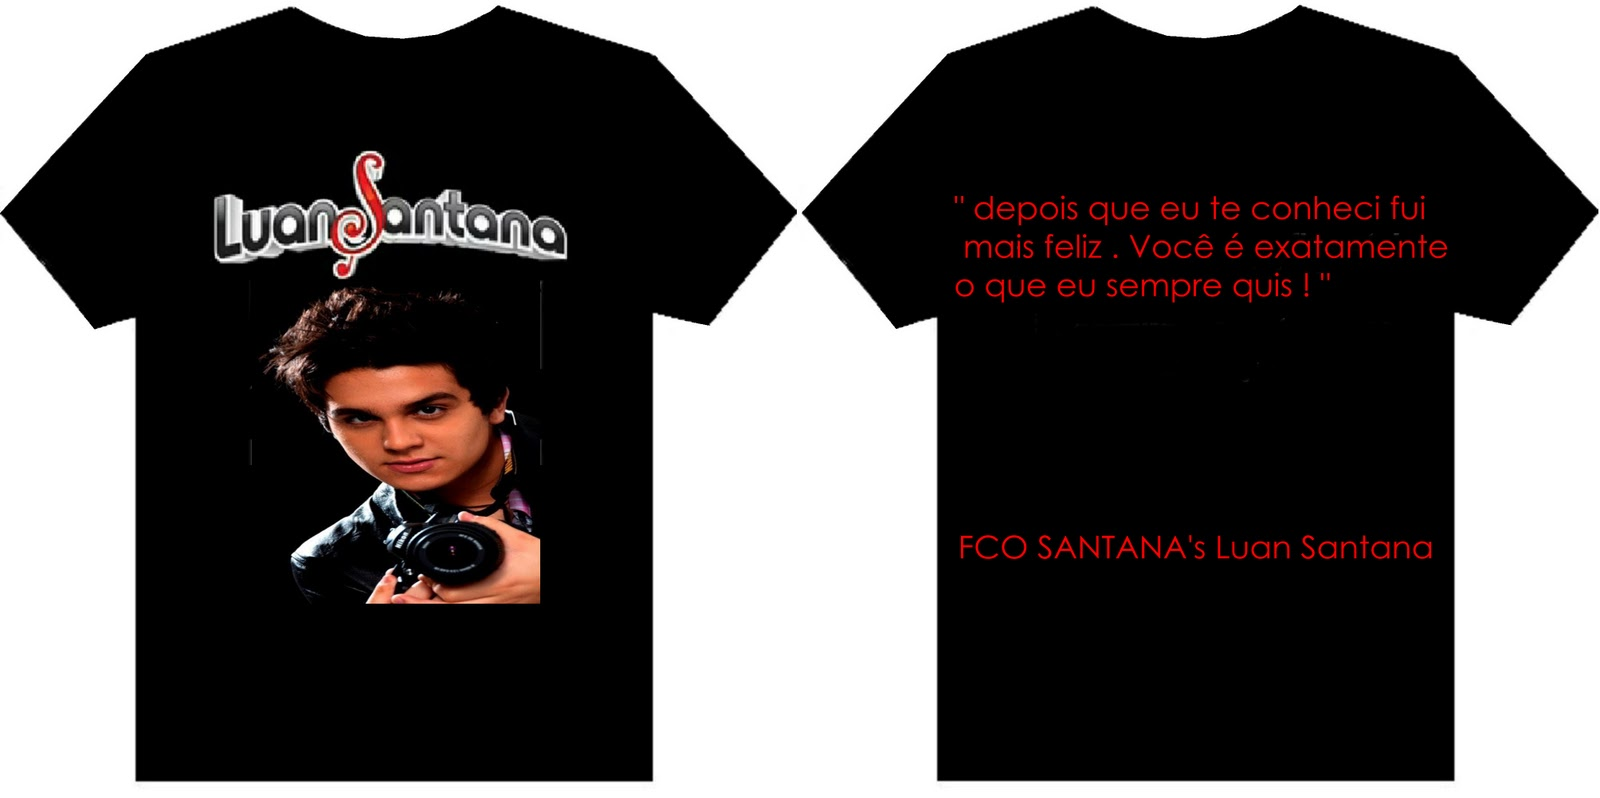 72c442bd75 FCO SANTANA s Luan Santana - DF  Camisetas  -